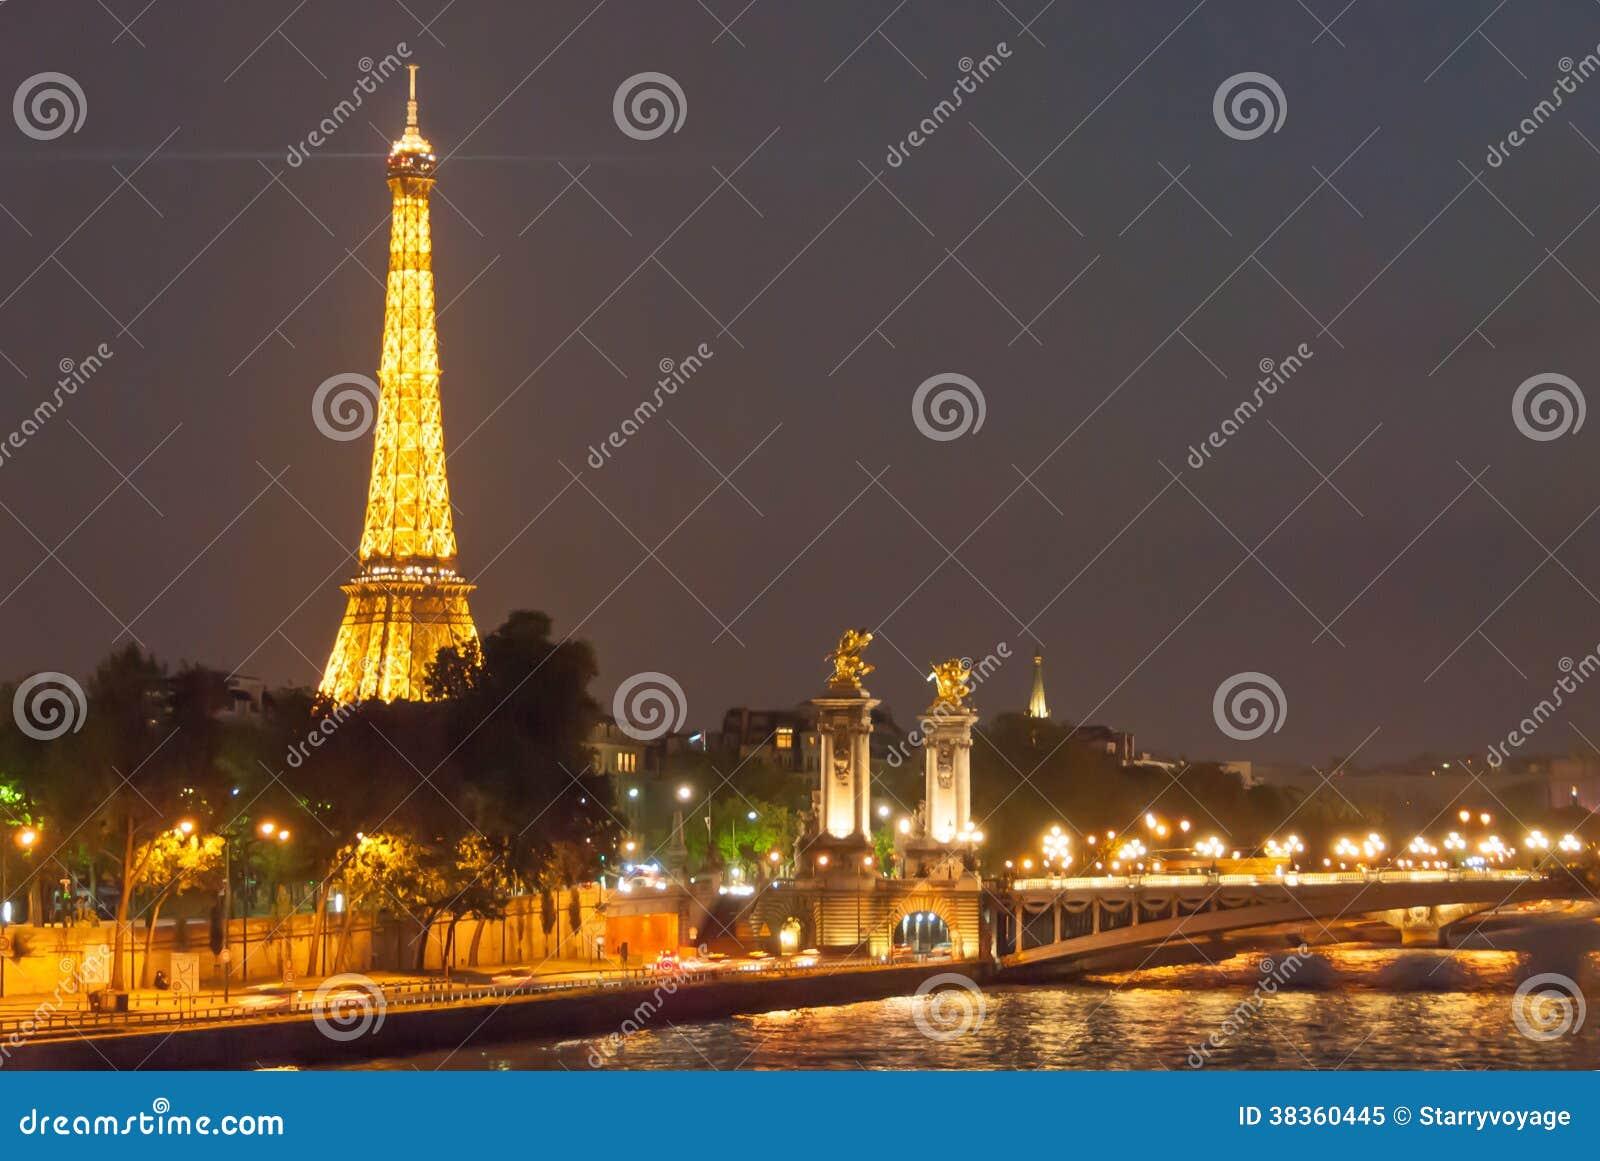 Torre Eiffel y Alexander Bridge en la noche II